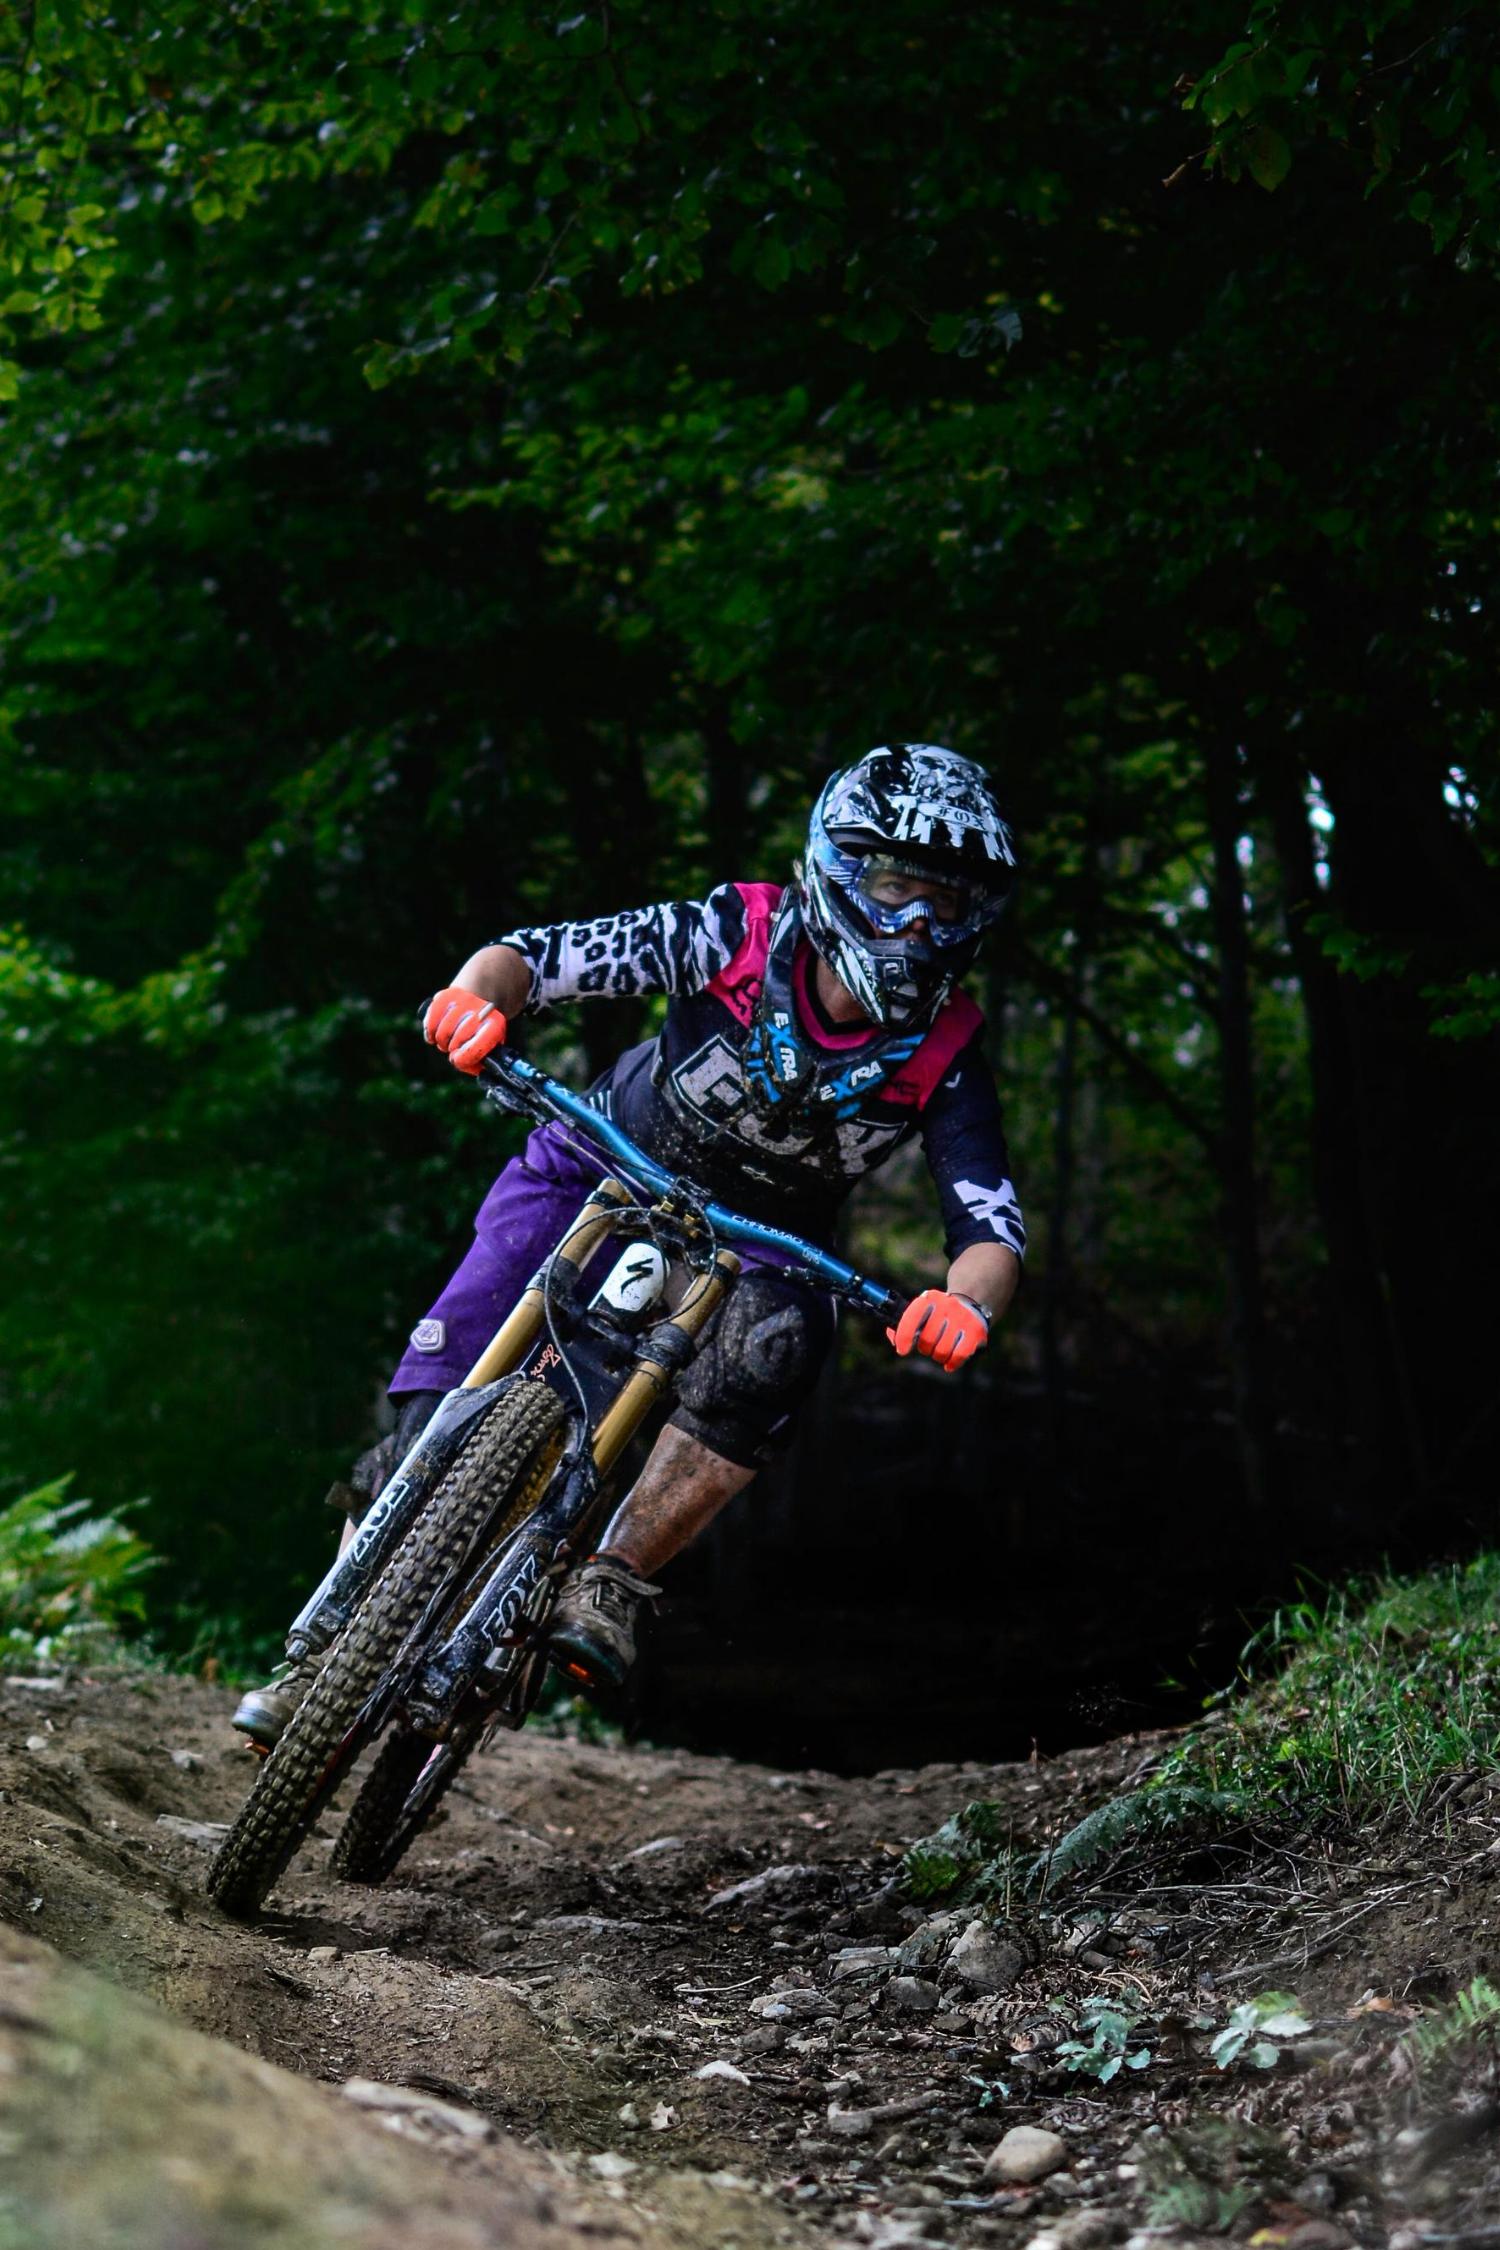 Racing Pro: My first mountain bike race ever